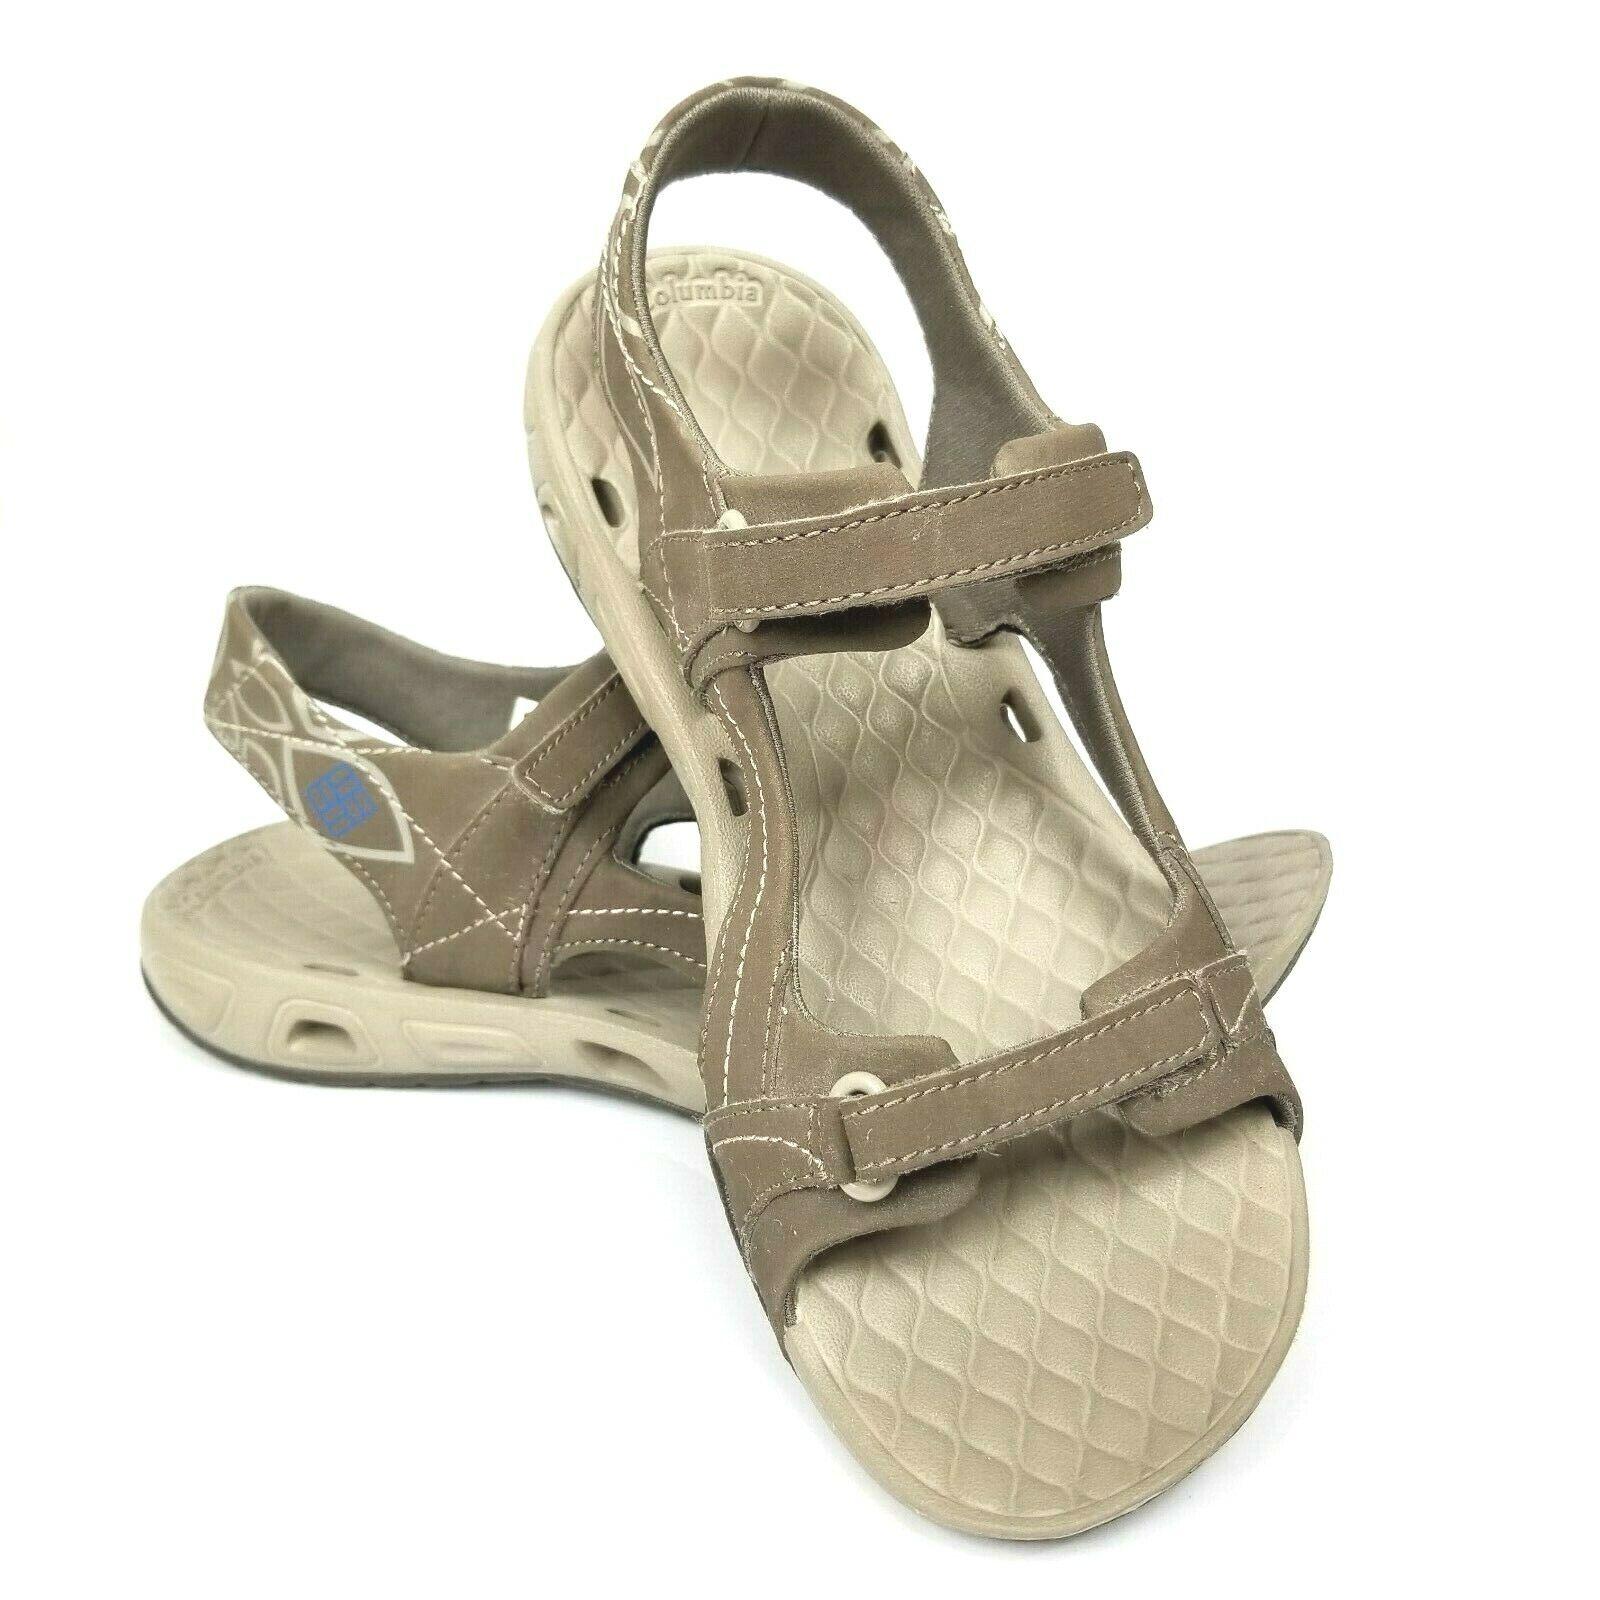 Columbia Athletic Omni-Grip Techlite Womens Sandal Brown Size 7